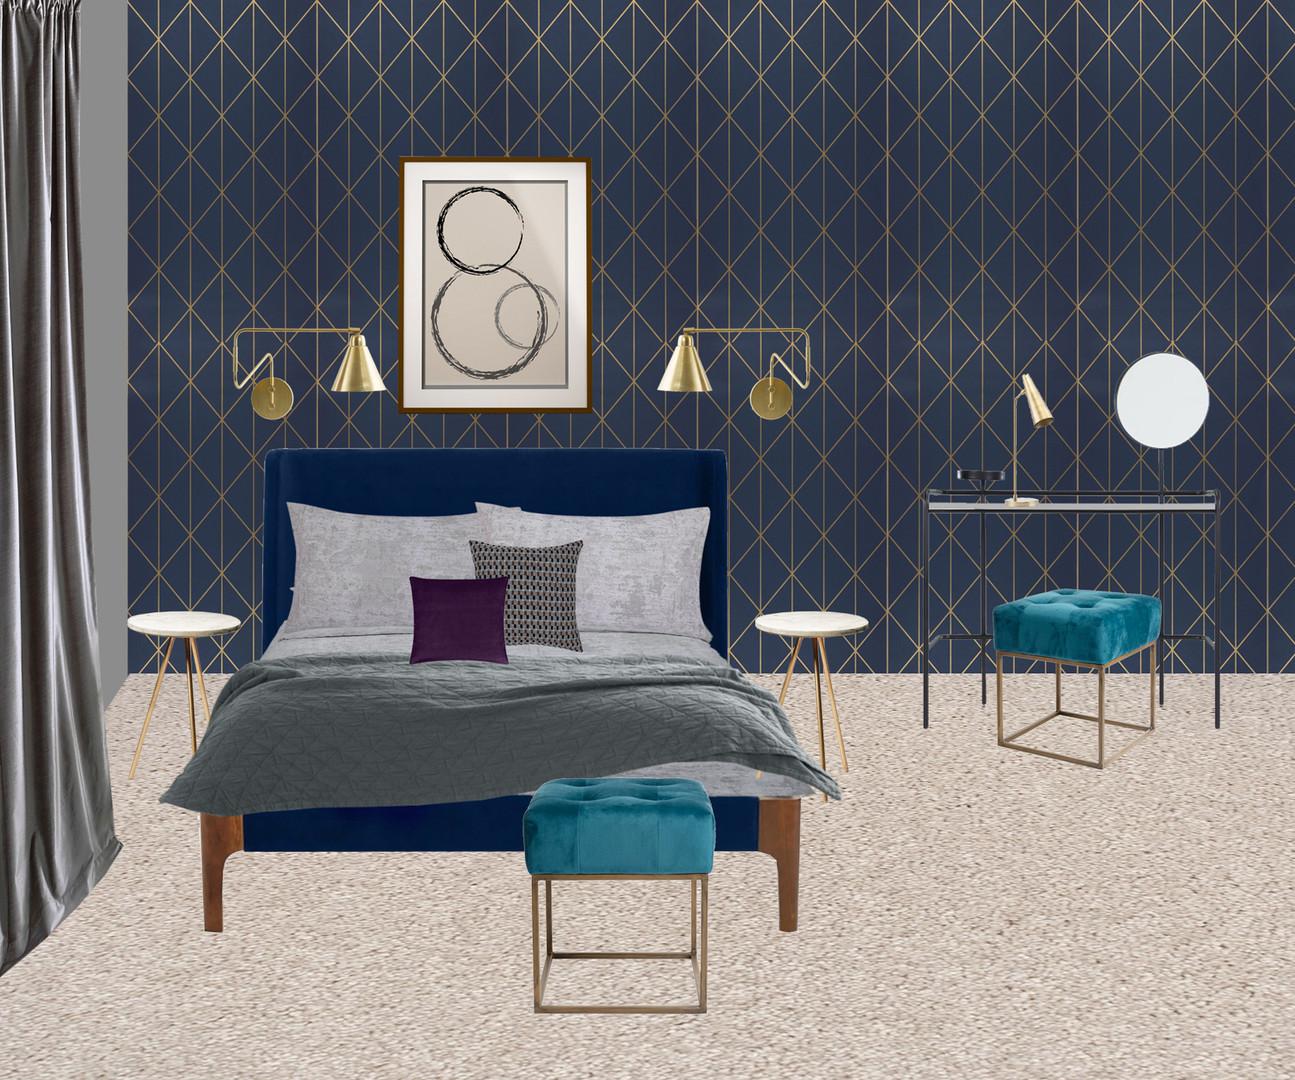 Collage Room Design.jpg